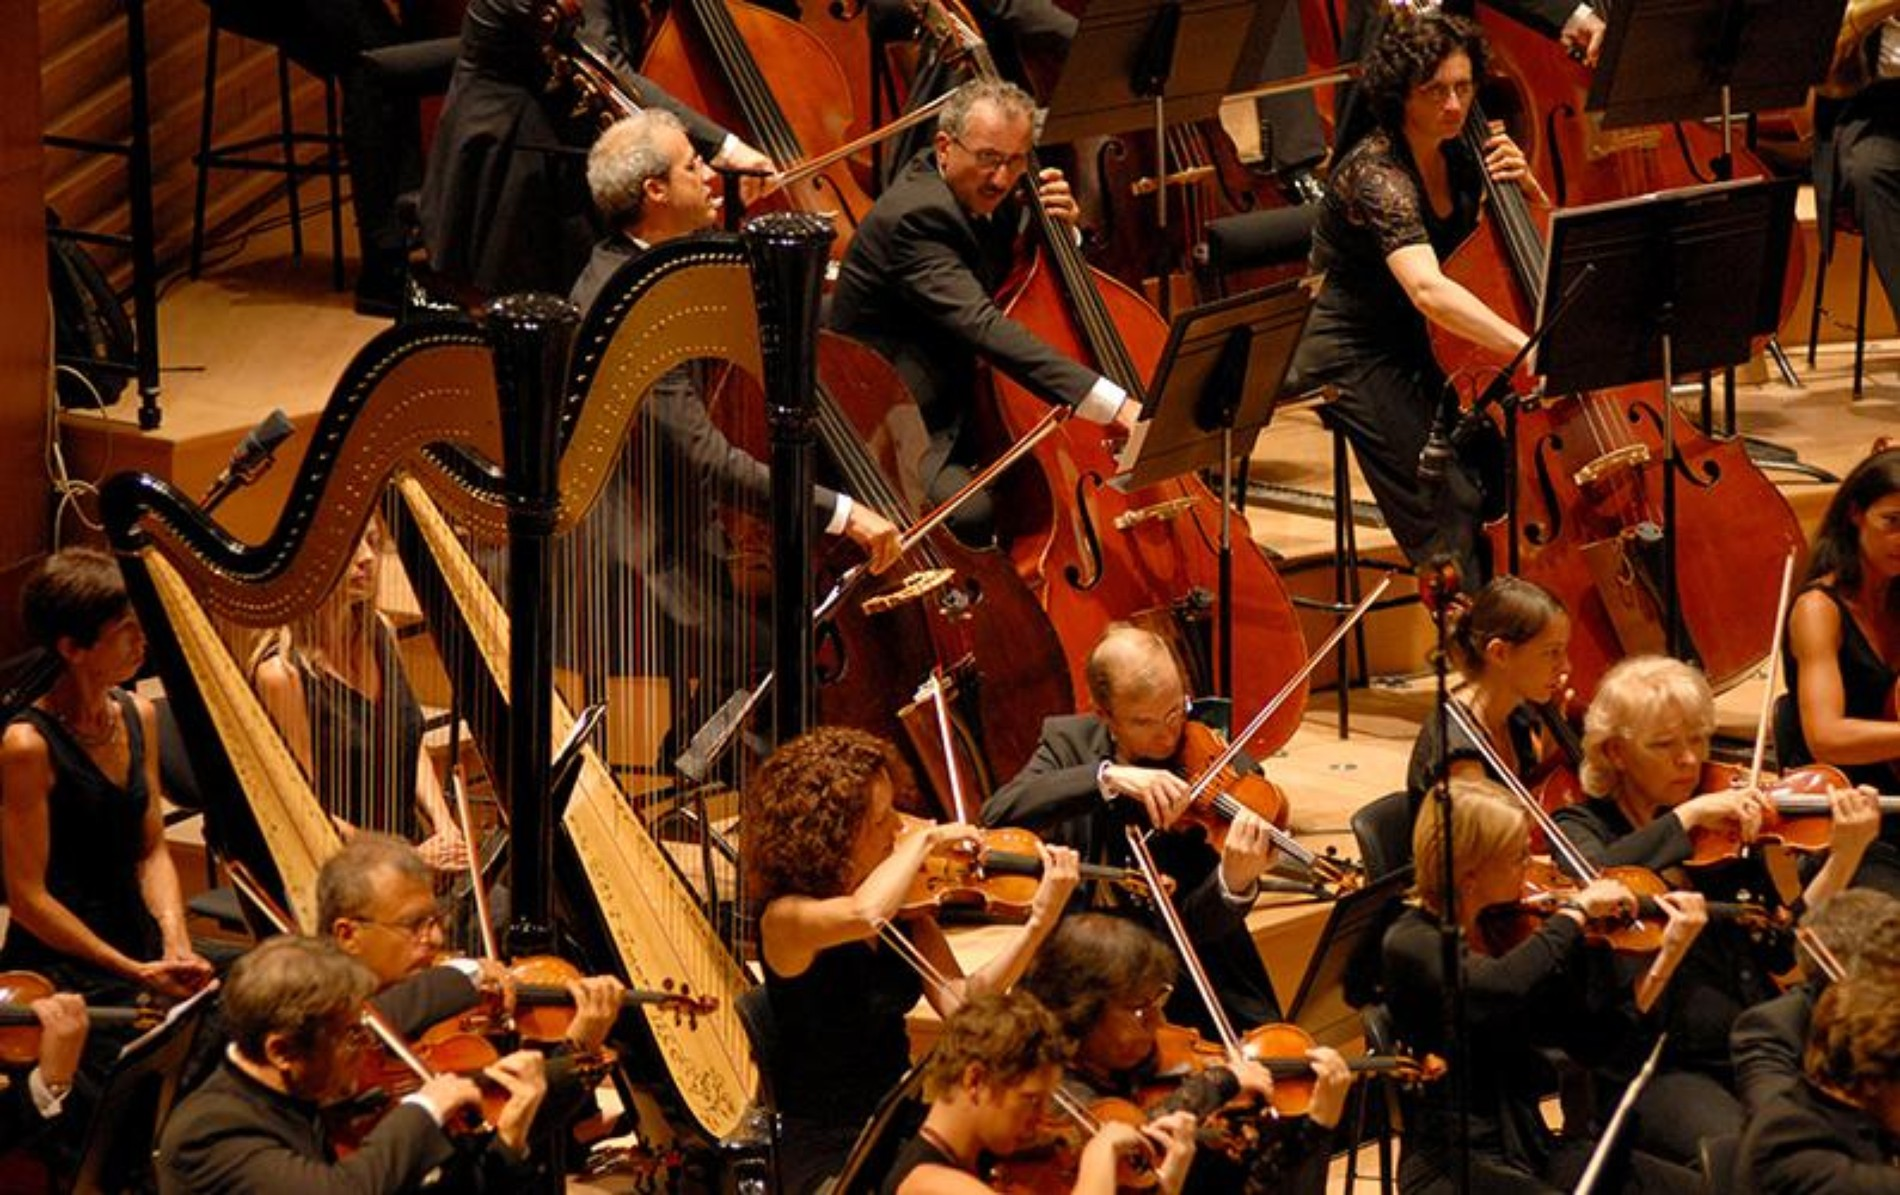 Empresa de Música clásica, Ópera y Coros en Alicante Liricalia